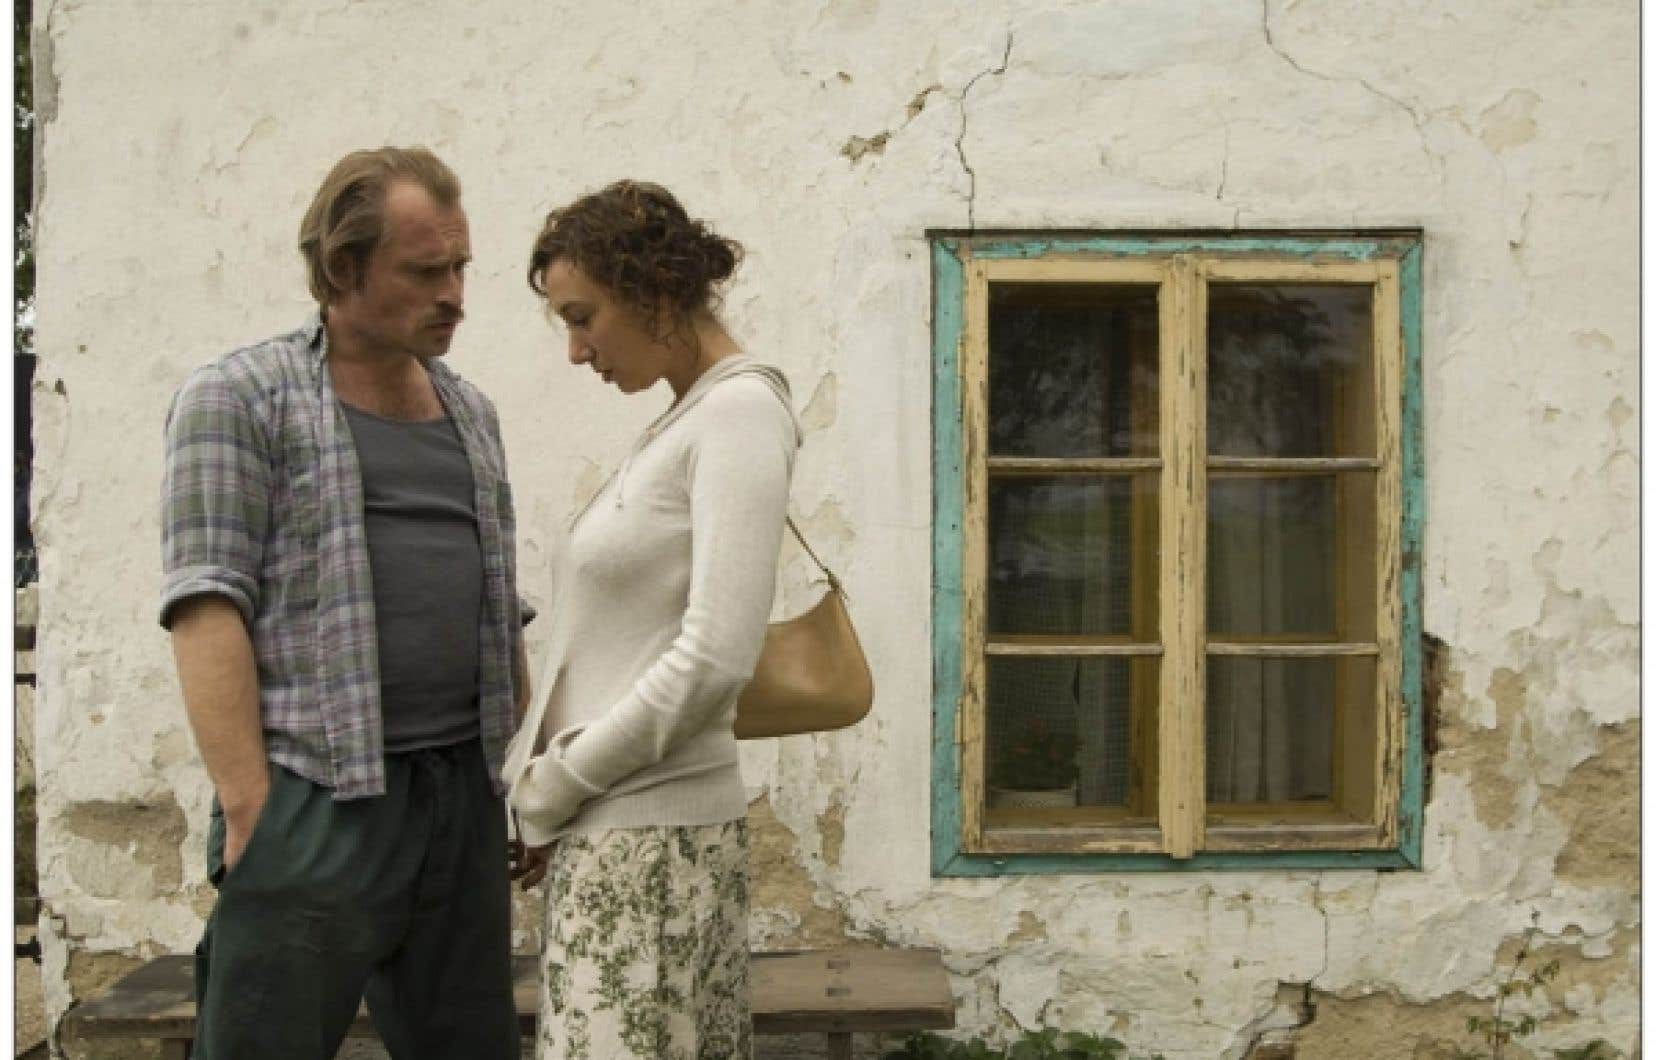 Johannes Krisch et Ursula Strauss dans Revanche, de Götz Spielmann